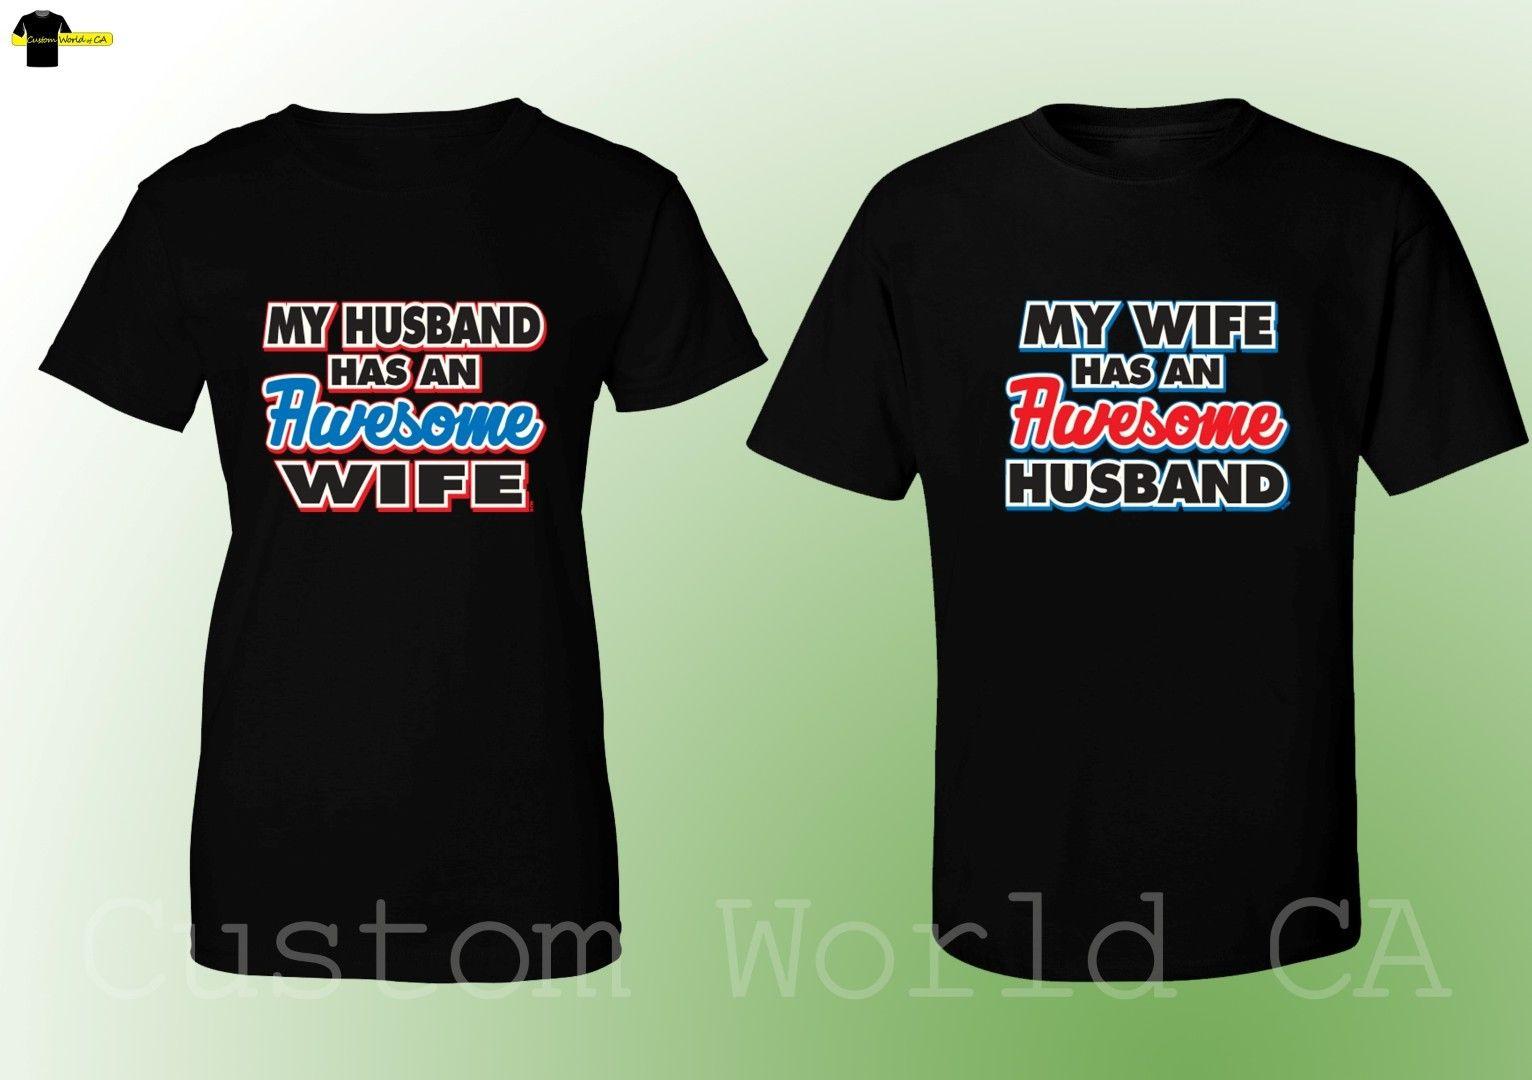 2018 Hot Sale 100% cotton Couple Matching T Shirts My Husband Wife Has An Awesome Wife Husband Tees XT Tee shirt